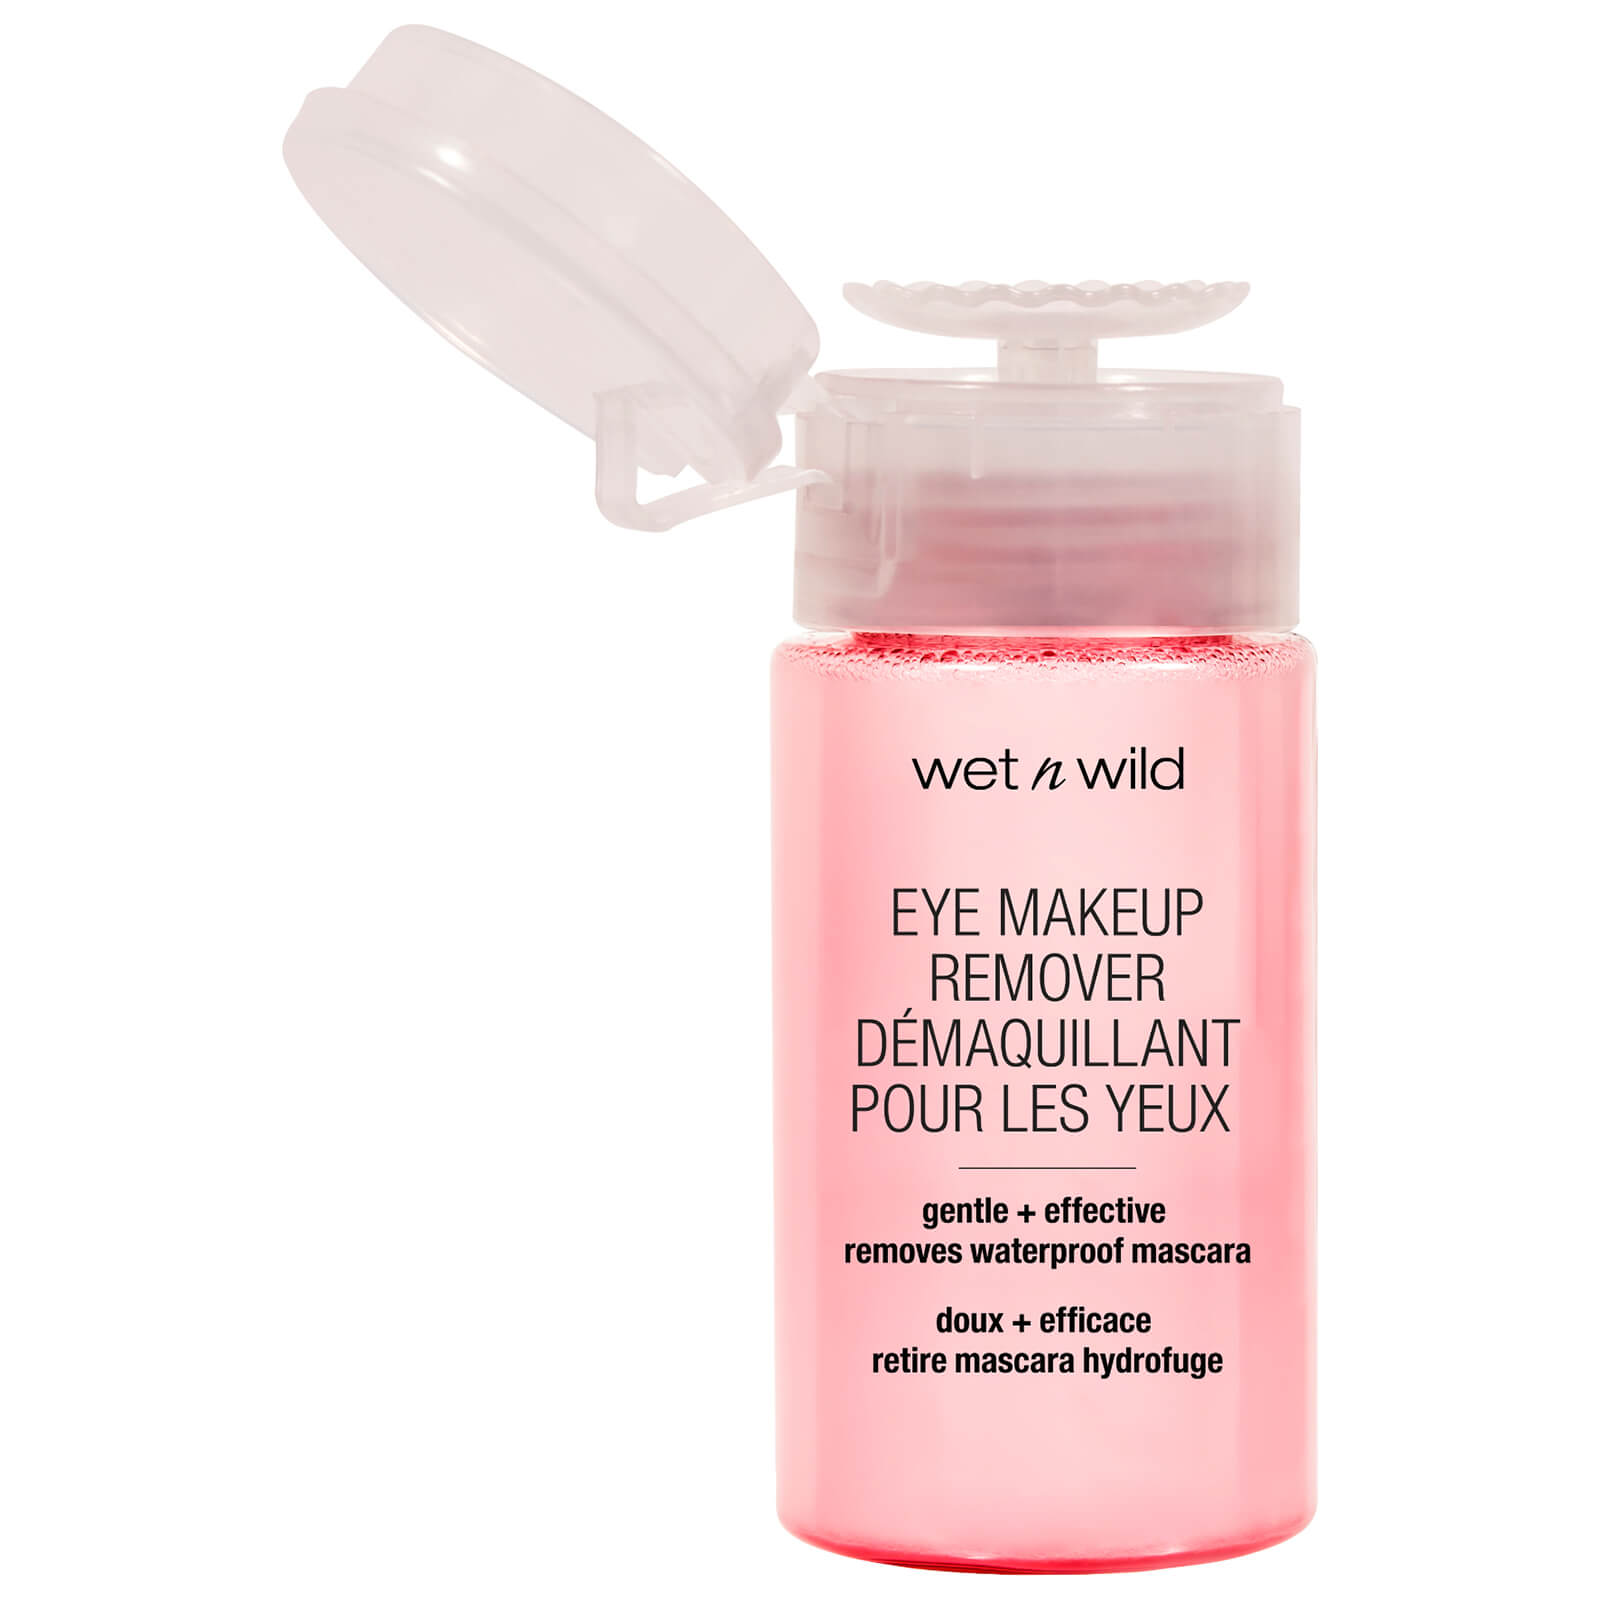 wet n wild Micellar Cleansing Water Makeup Remover 30g